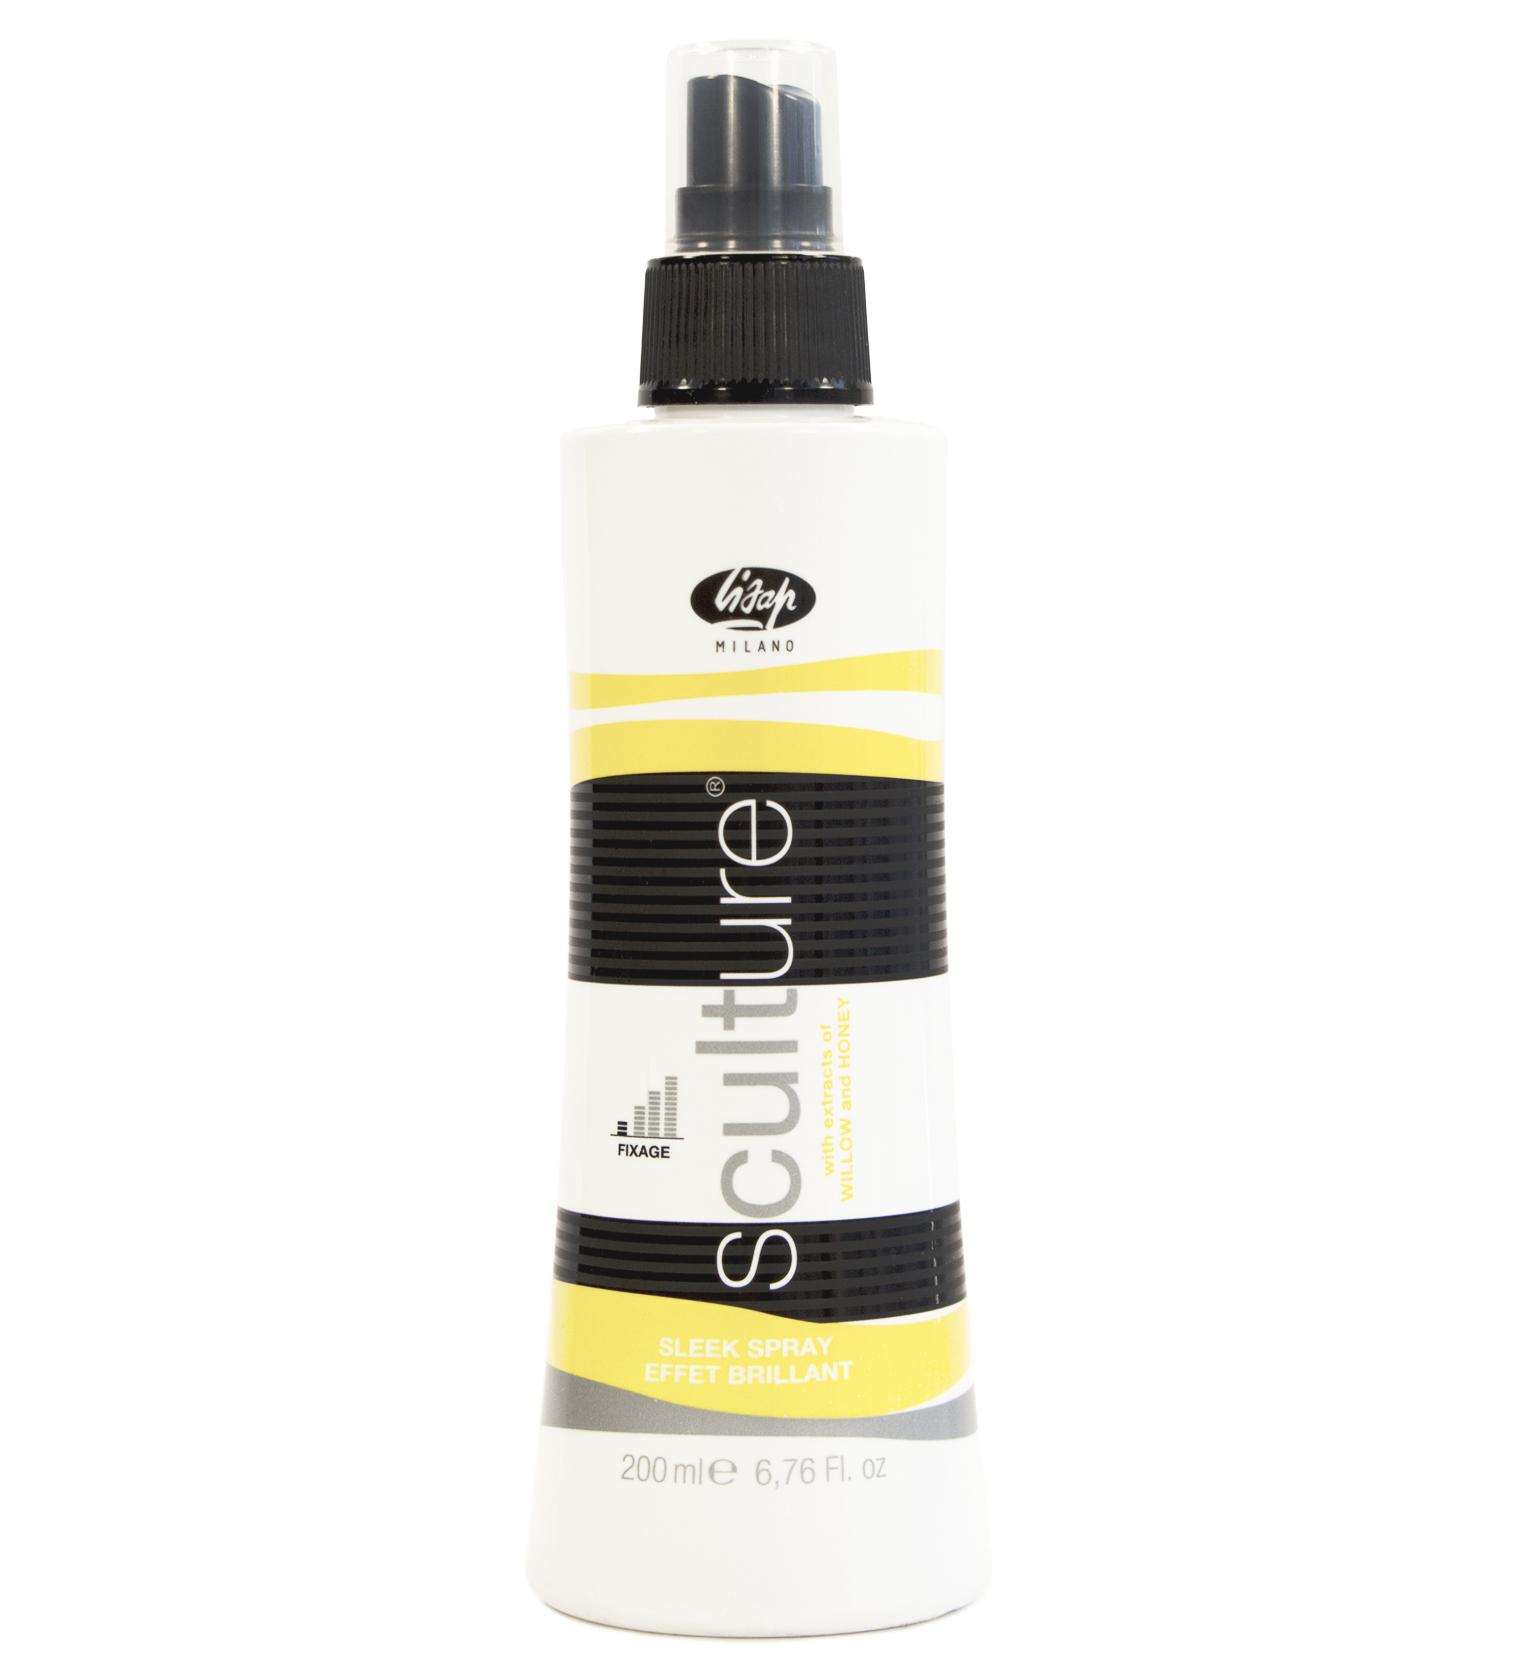 Lisap Спрей-Блеск для Волос Эластичной Фиксации Sculture Sleek Spray, 200 мл lisap milano fashion gloss shine спрей блеск для волос 250 мл